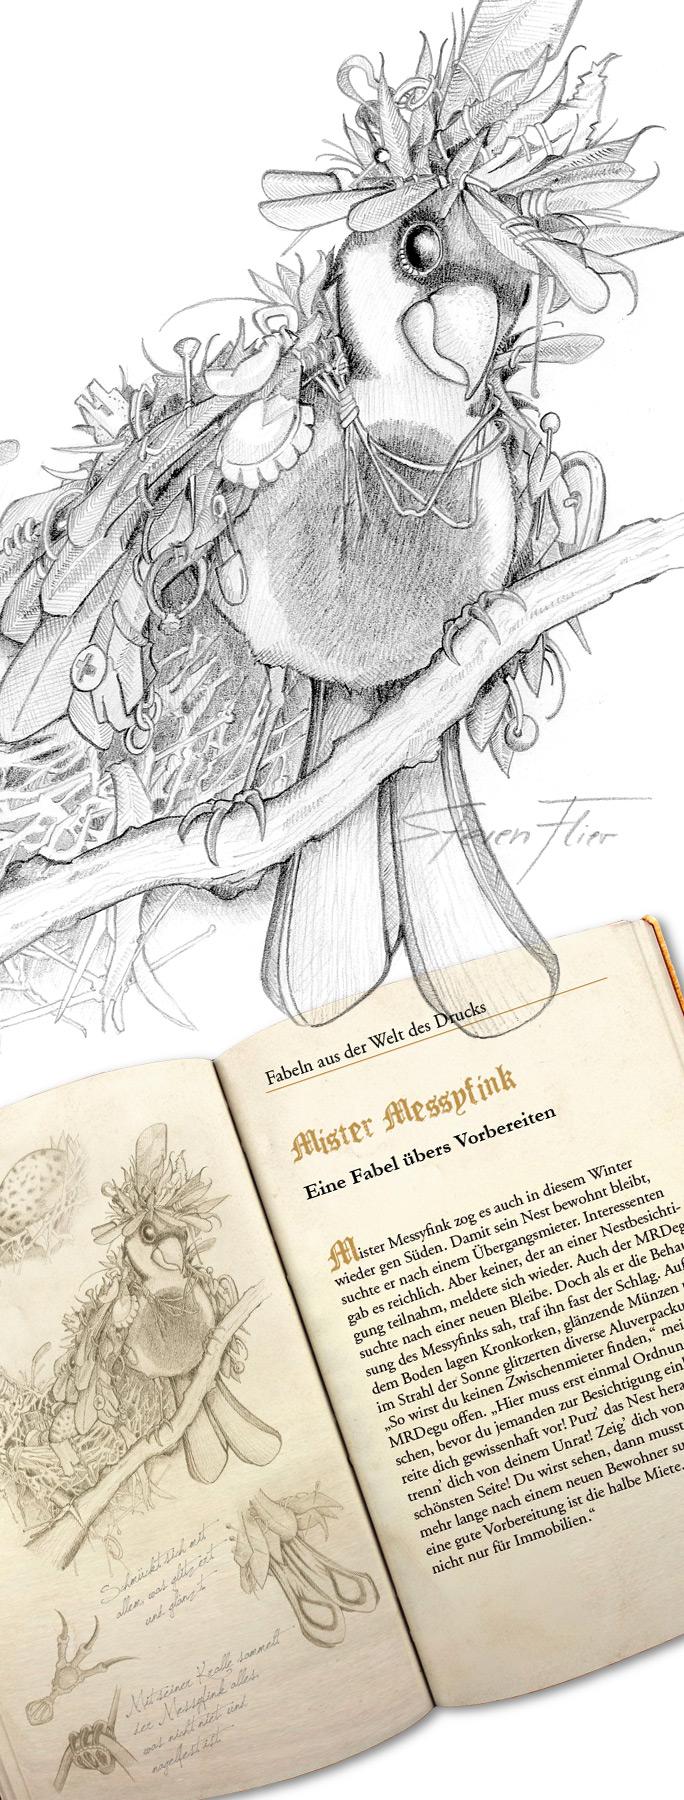 Pencil, Bleistift, Illustration, Fabeltier, Fabulous Beast, Druckerei MRD, Brockschmidt, Steven Flier